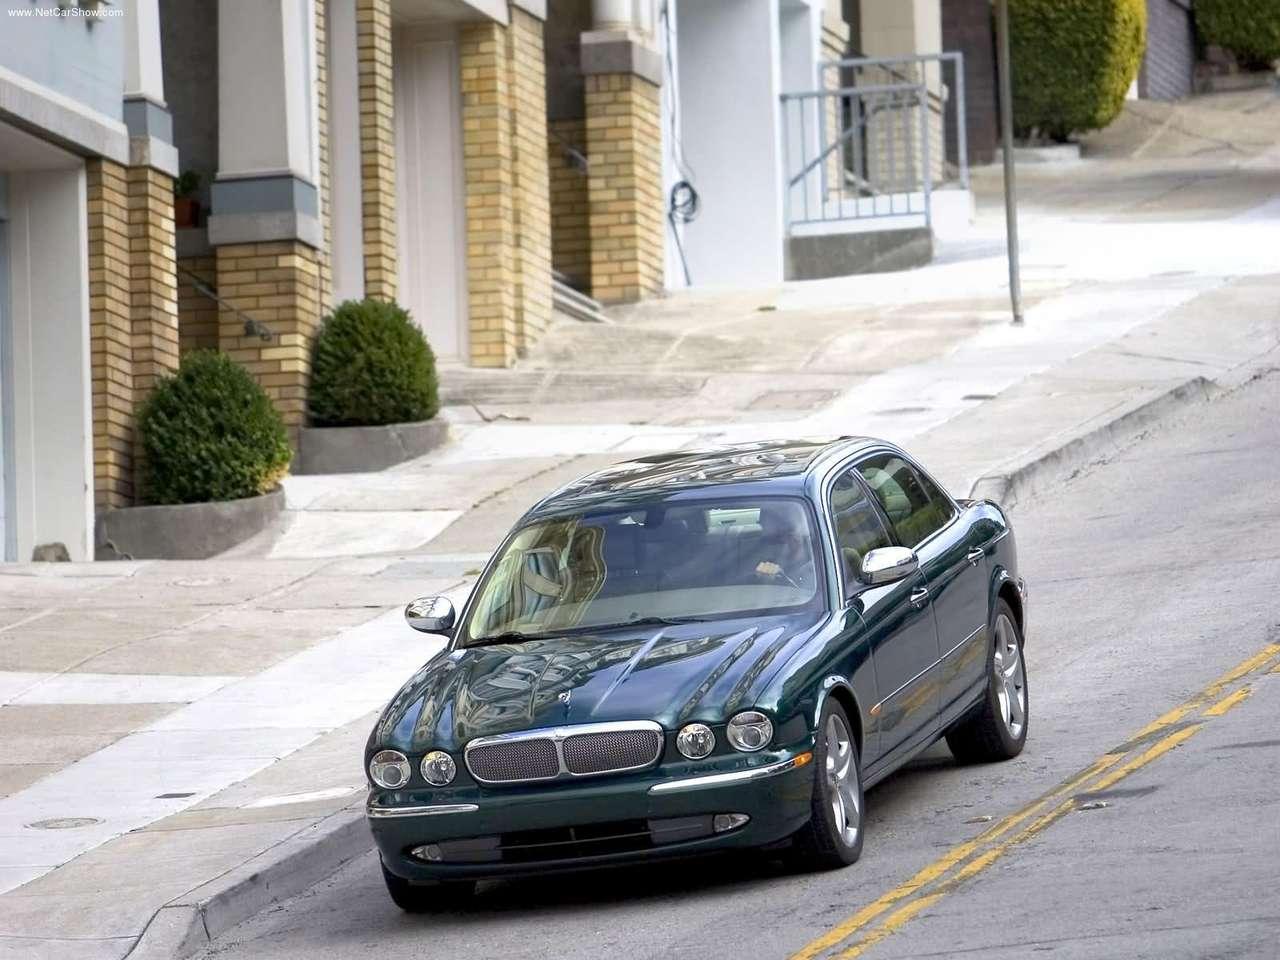 http://3.bp.blogspot.com/-YpFIGXnCbqM/TZljujVt4ZI/AAAAAAAACf0/rzN9CumV5ts/s1600/Jaguar-XJ_Super_V8_2005_1280x960_wallpaper_07.jpg